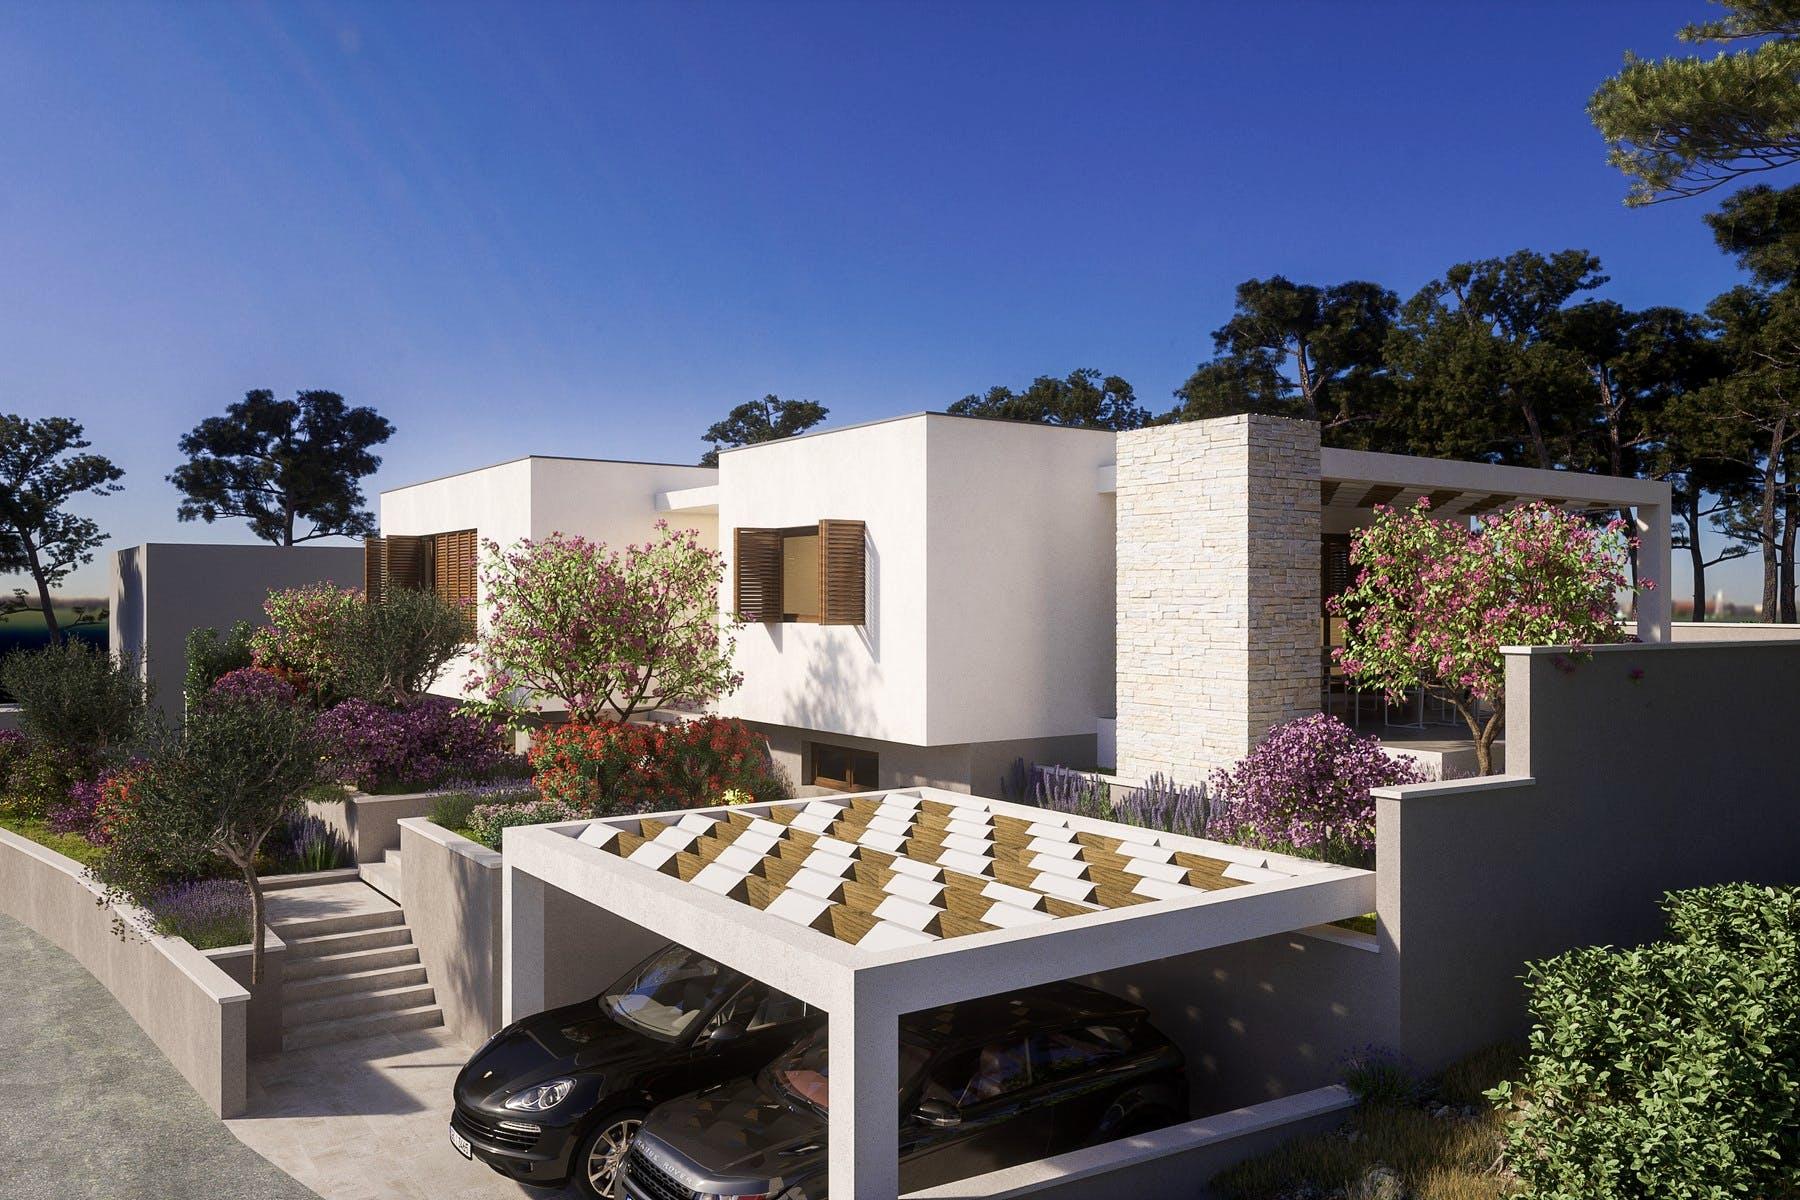 Newly built villa by the sea in a quiet environment near Šibenik for sale